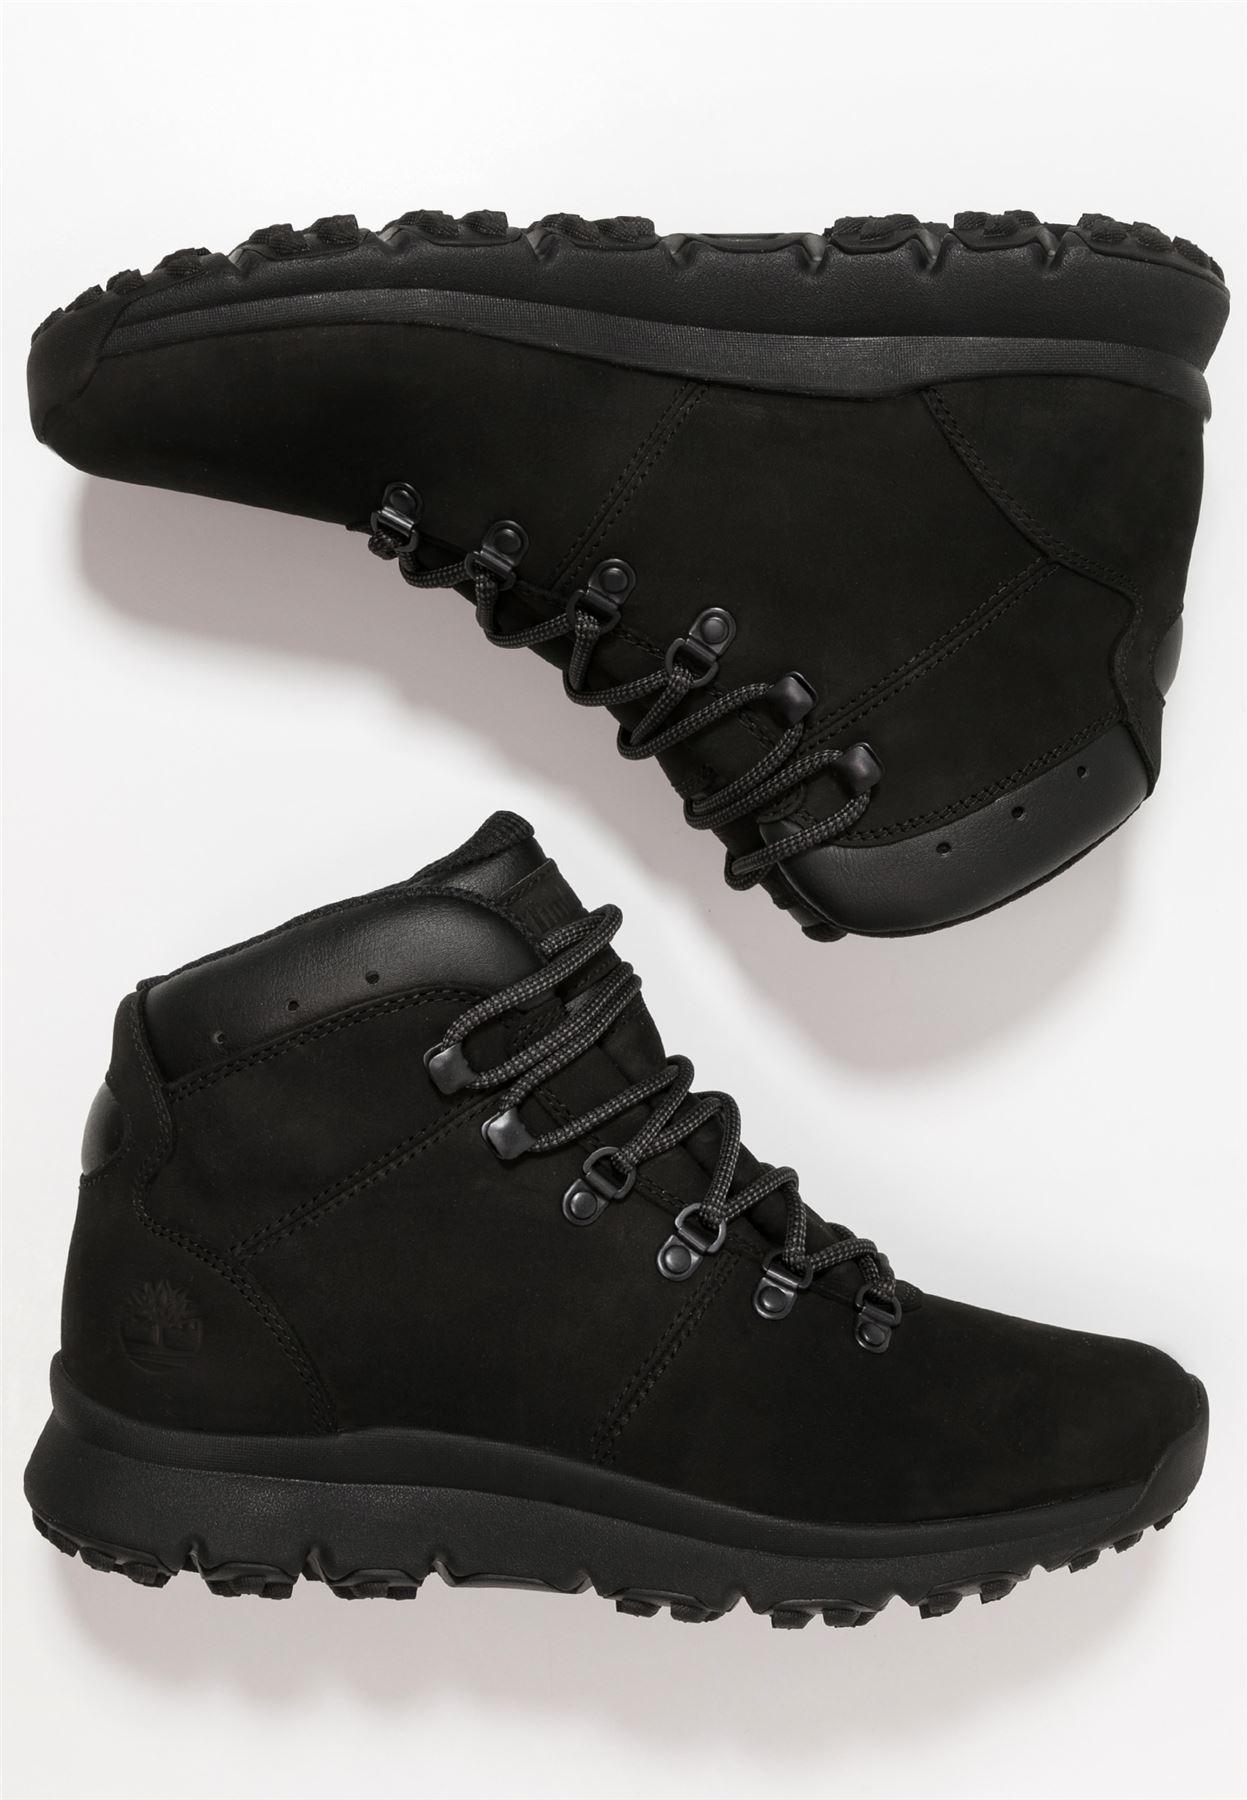 diseño elegante primer nivel productos de calidad Timberland Hombre Mundo Bota Alpinista Timbs Zapatos Negros | eBay